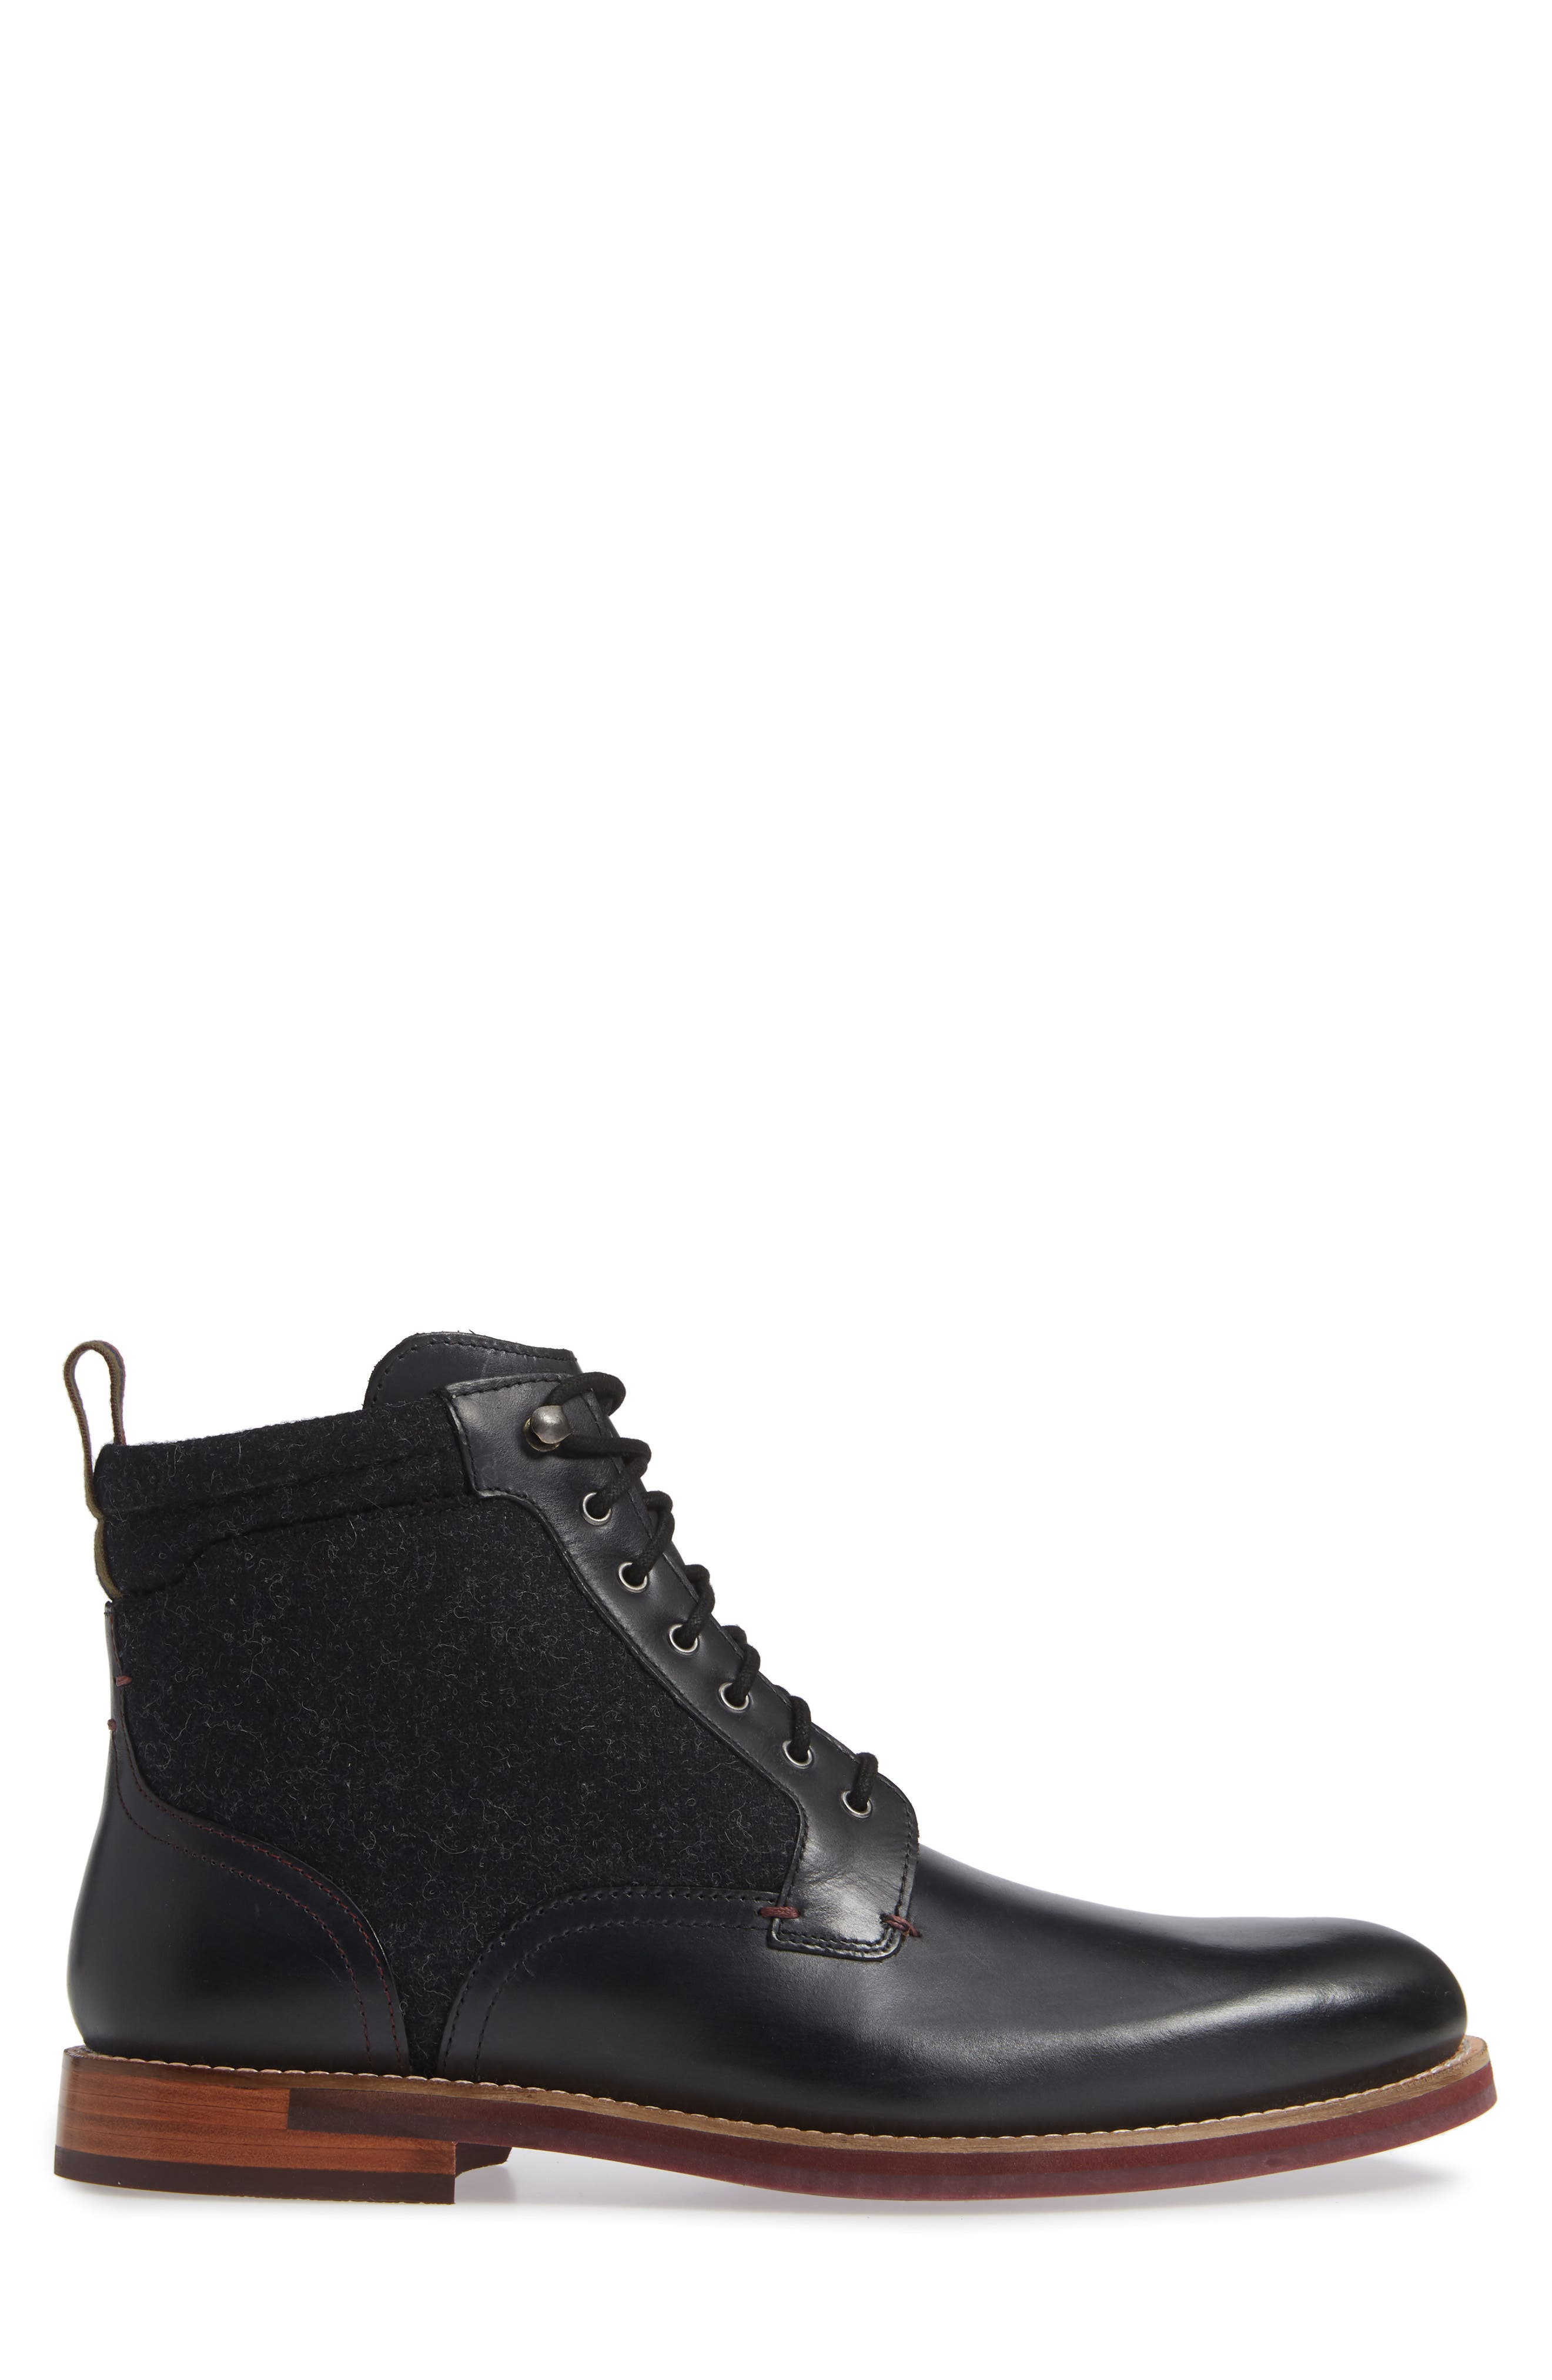 Axtoni Boot,                             Alternate thumbnail 3, color,                             001